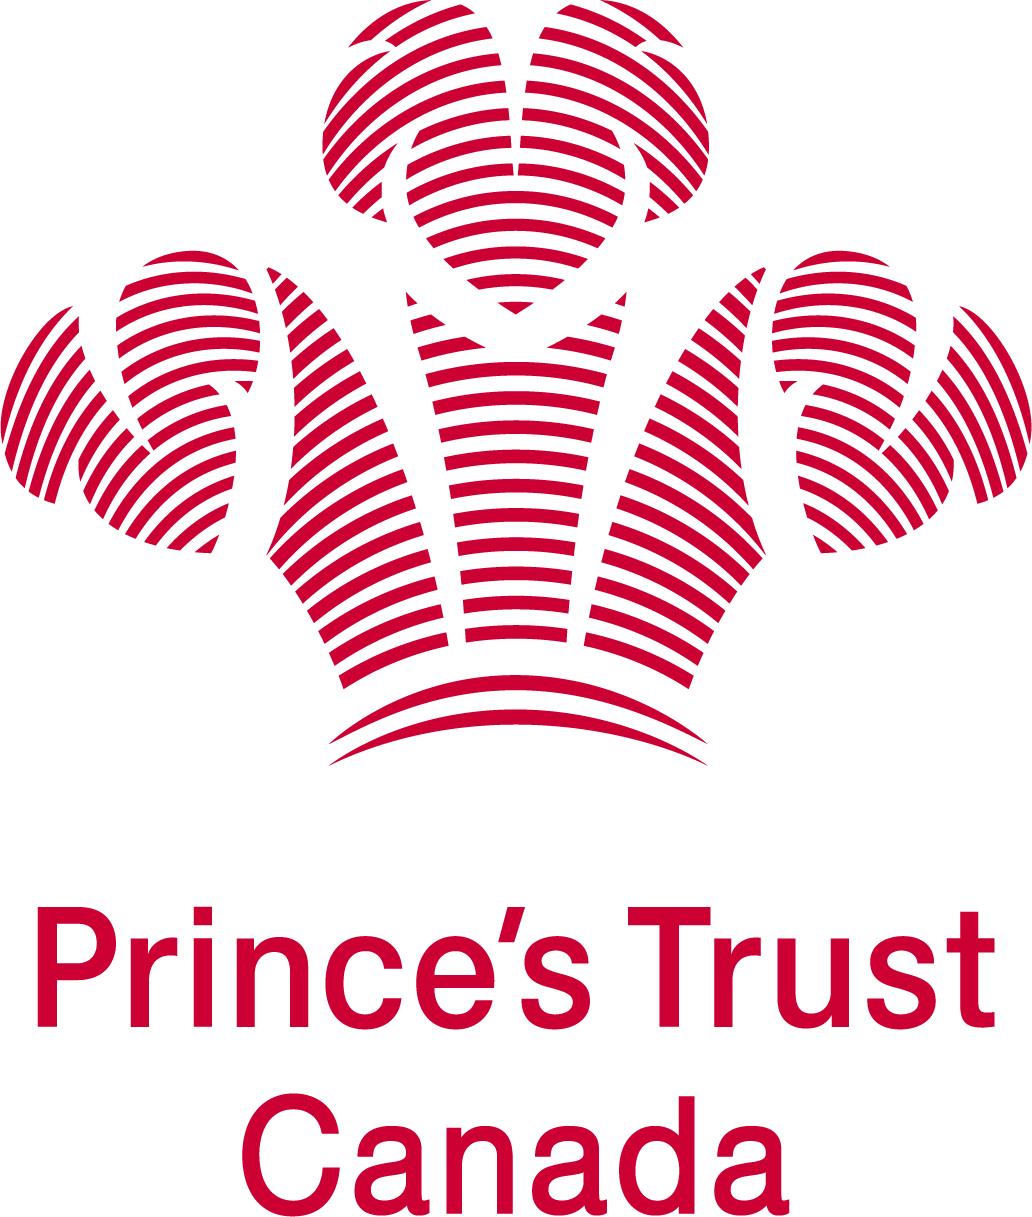 Prince's Trust Canada Logo